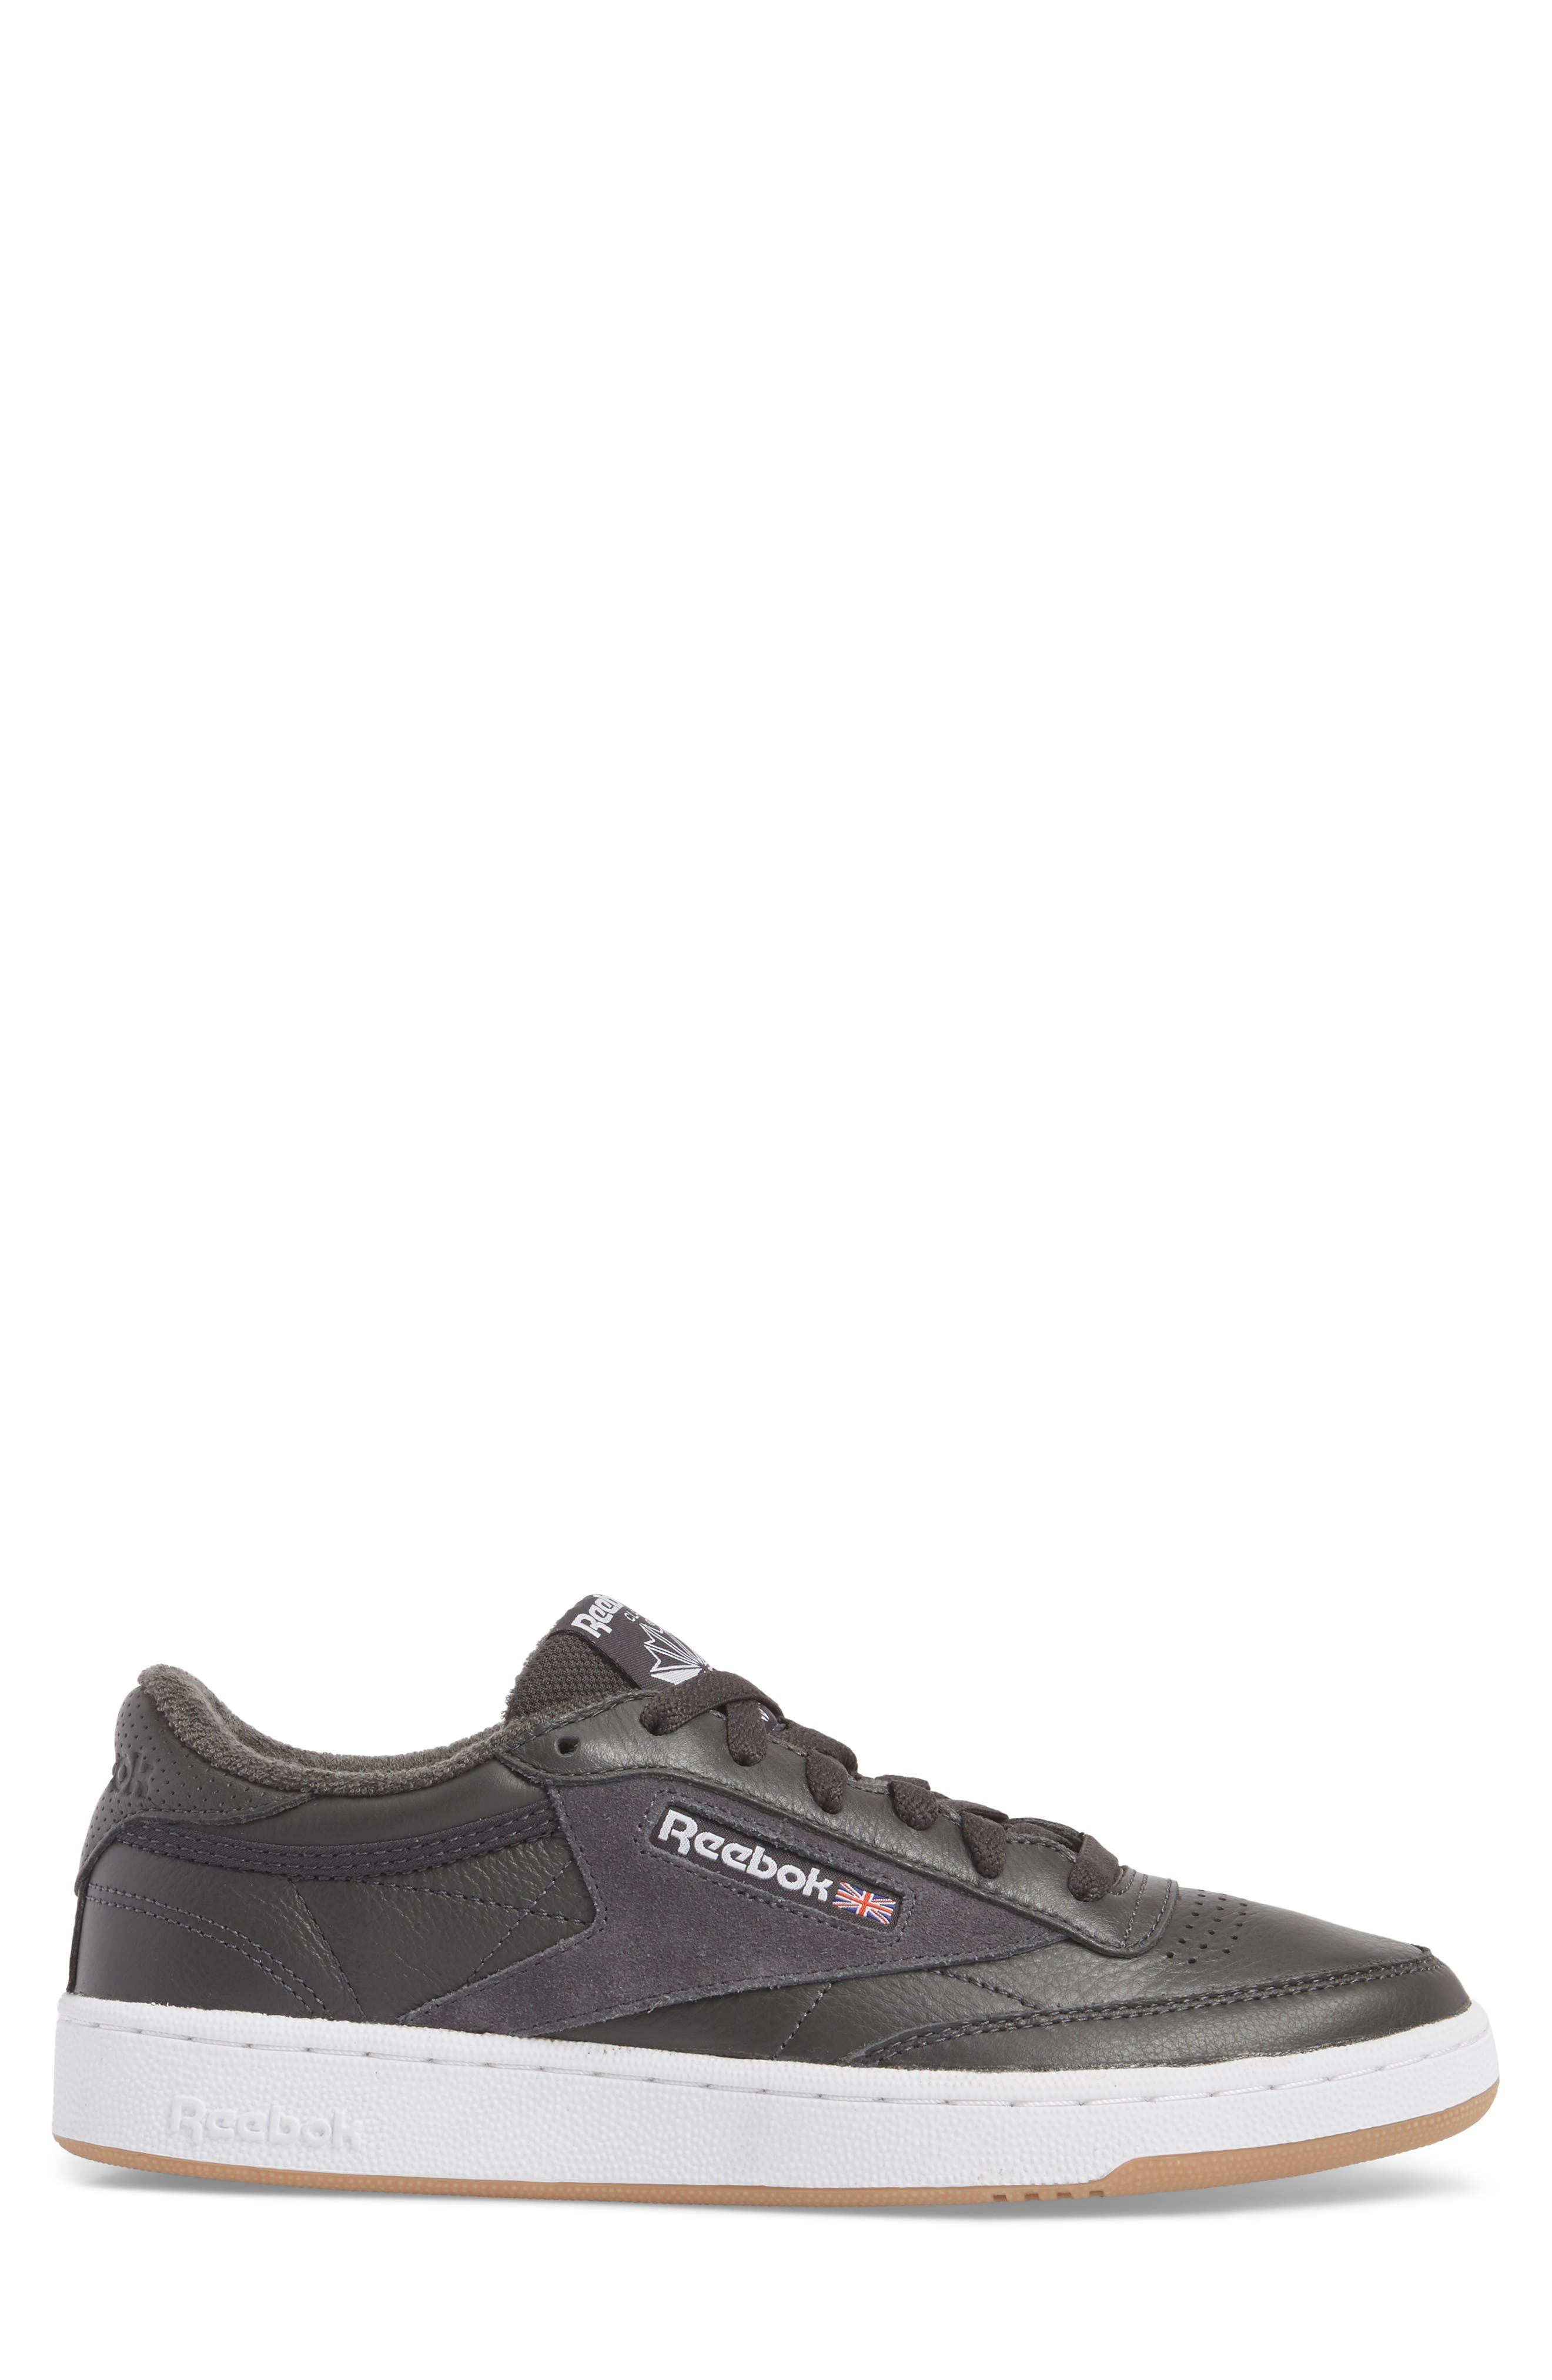 Club C 85 ESTL Sneaker,                             Alternate thumbnail 3, color,                             Coal/ White/ Washed Blue